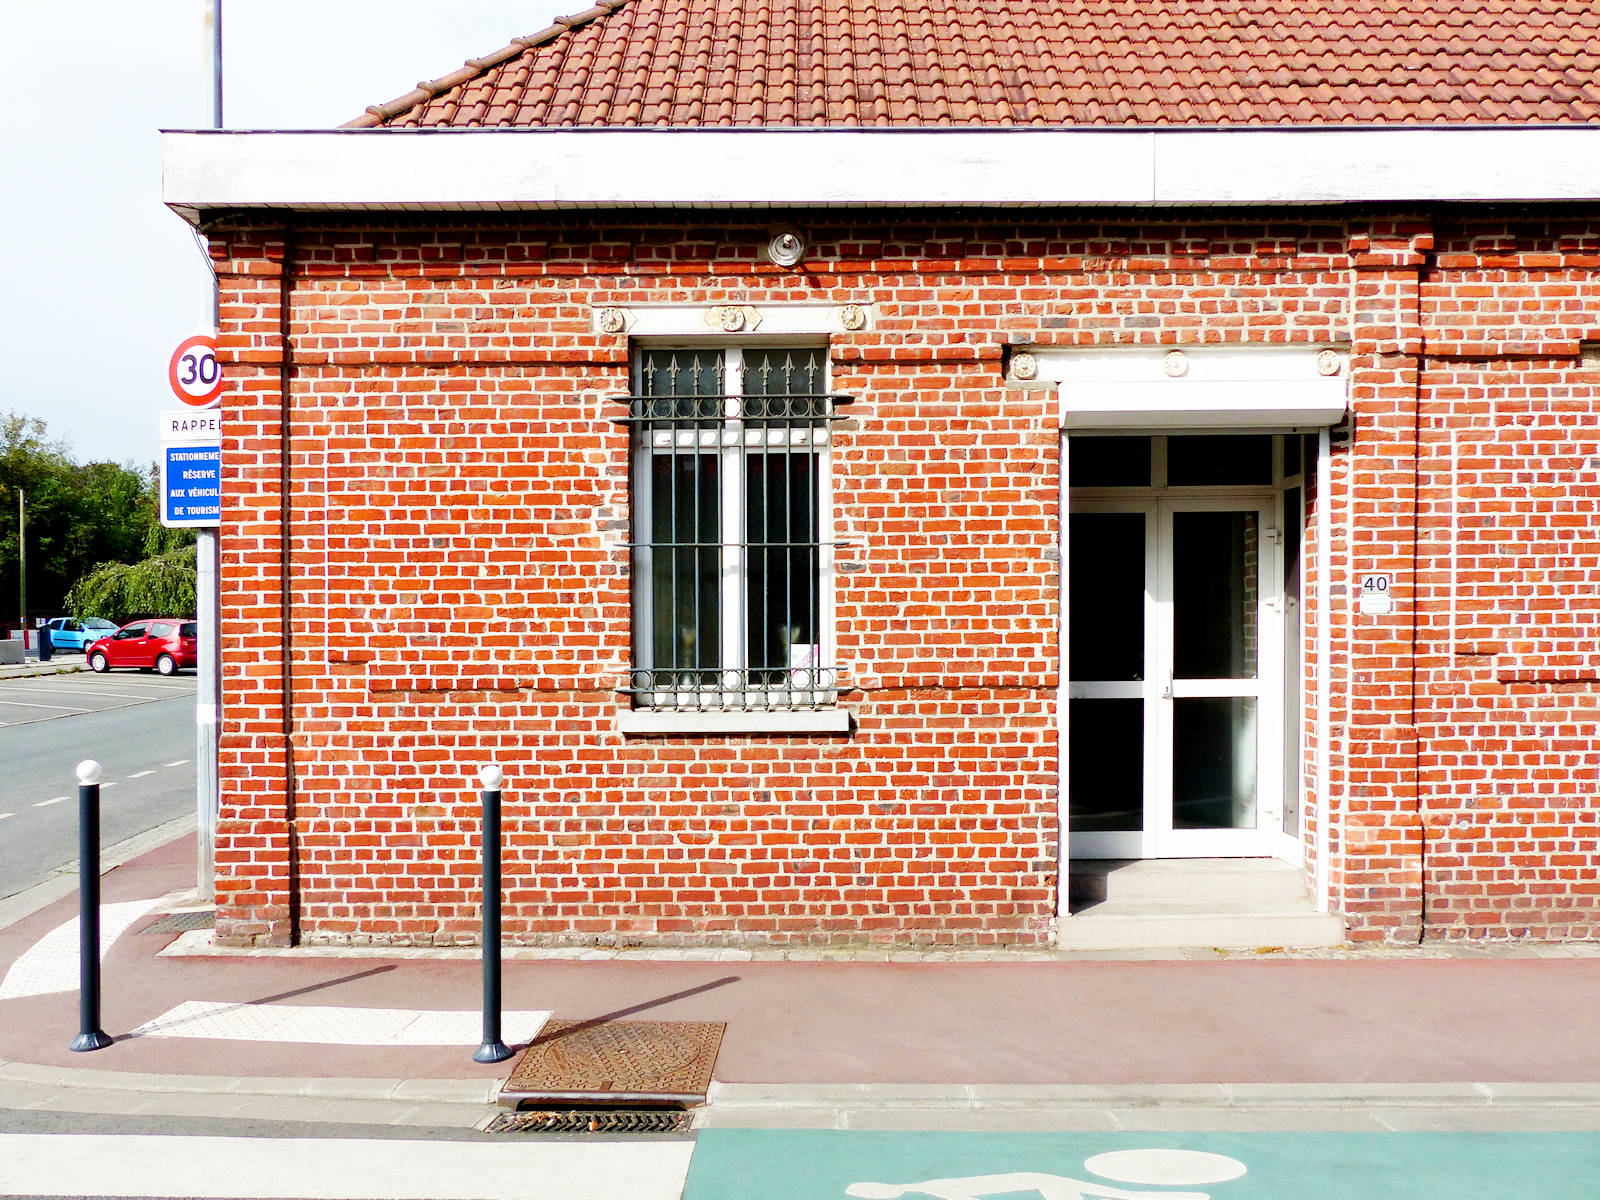 Association des Anciens Élèves de l'E.I.C. - Tourcoing, rue Jules Watteeuw.